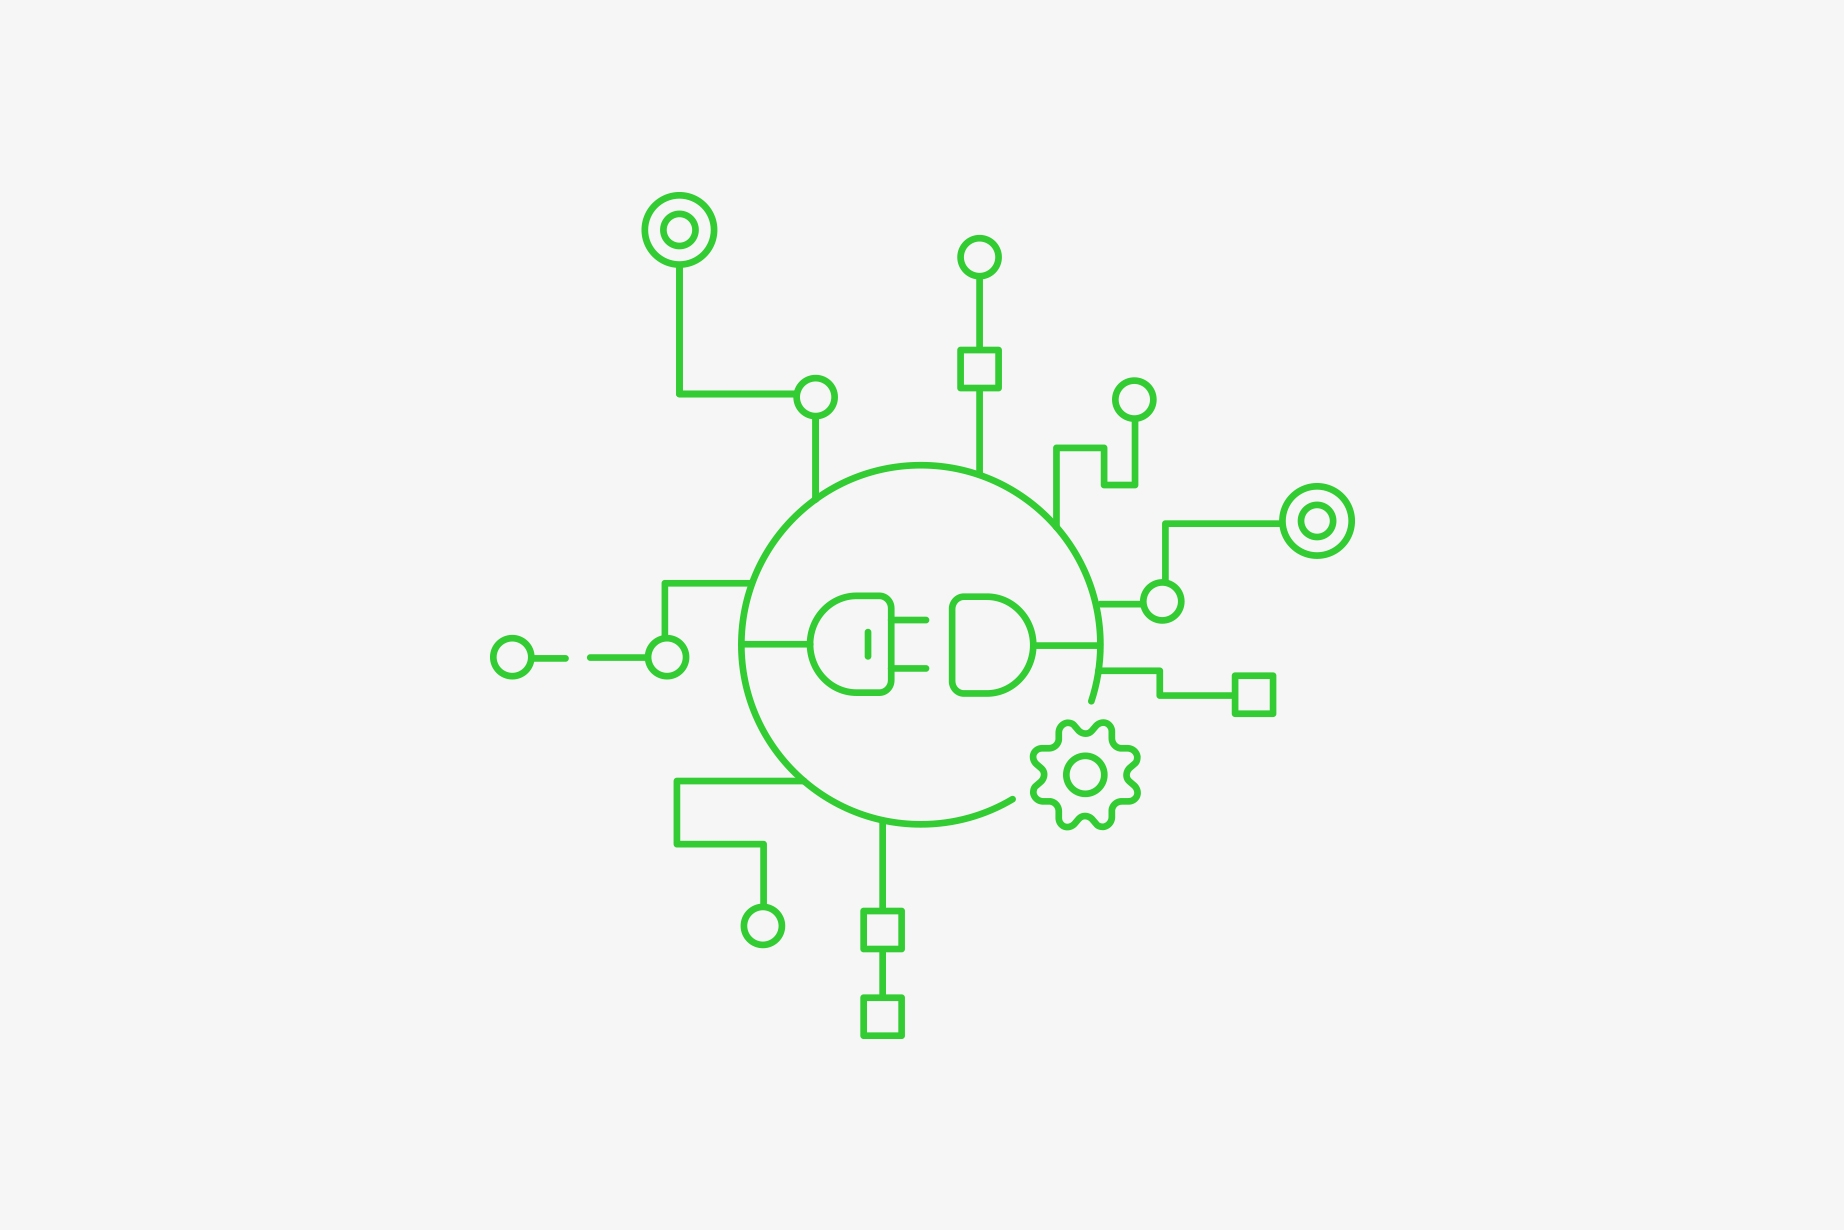 Trustly Plugins - Illustration showing Trustly integration via plugins